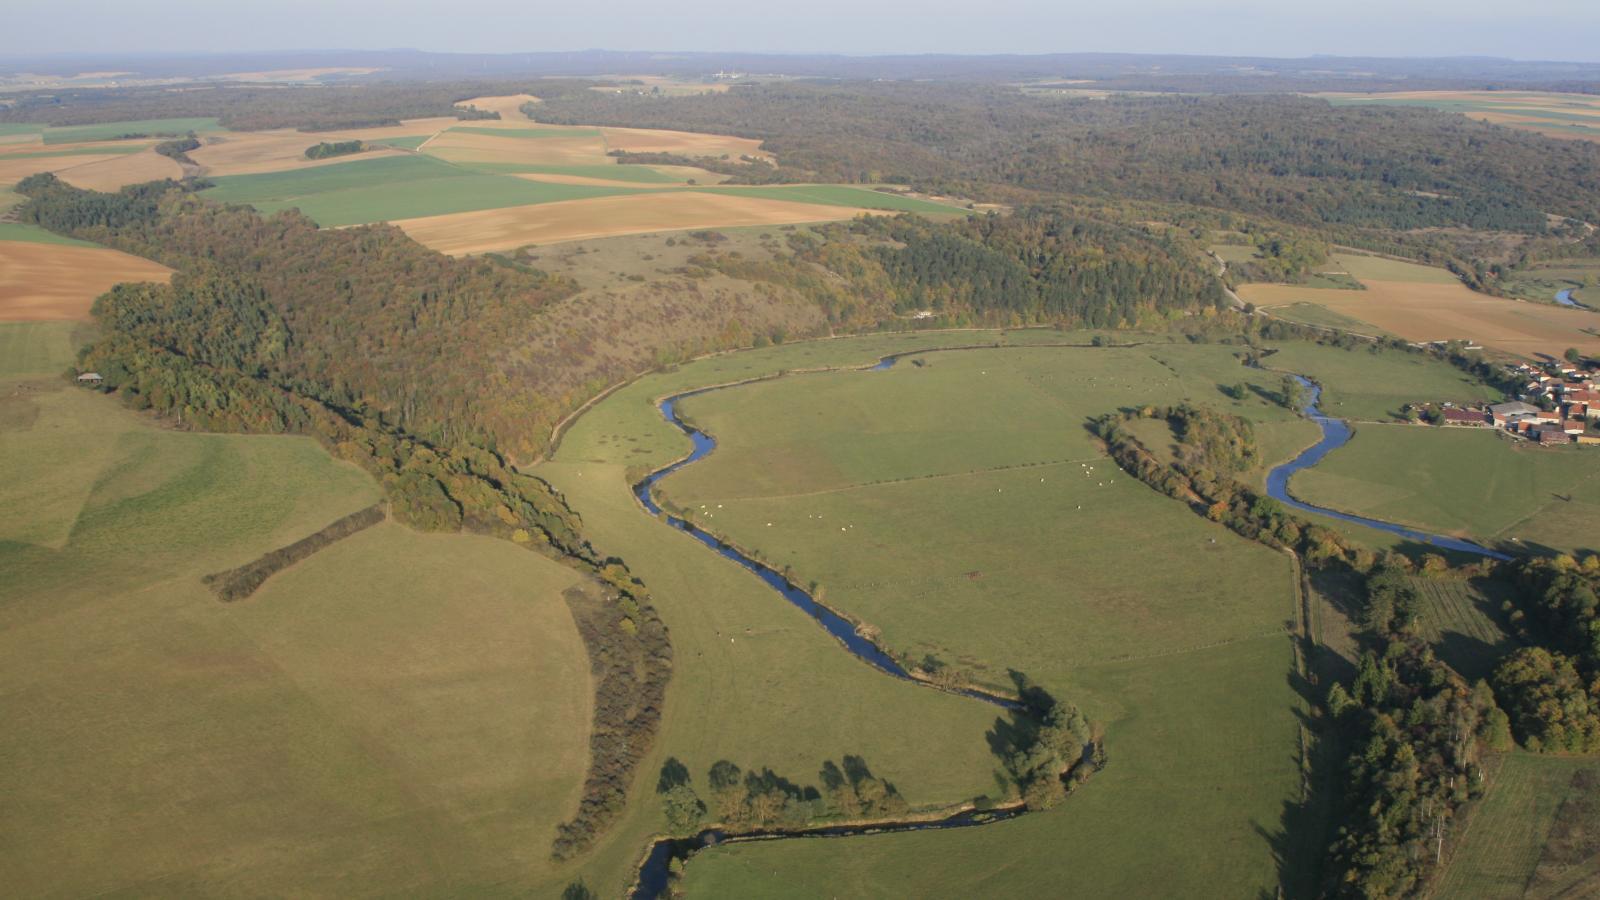 Les méandres de la Meuse